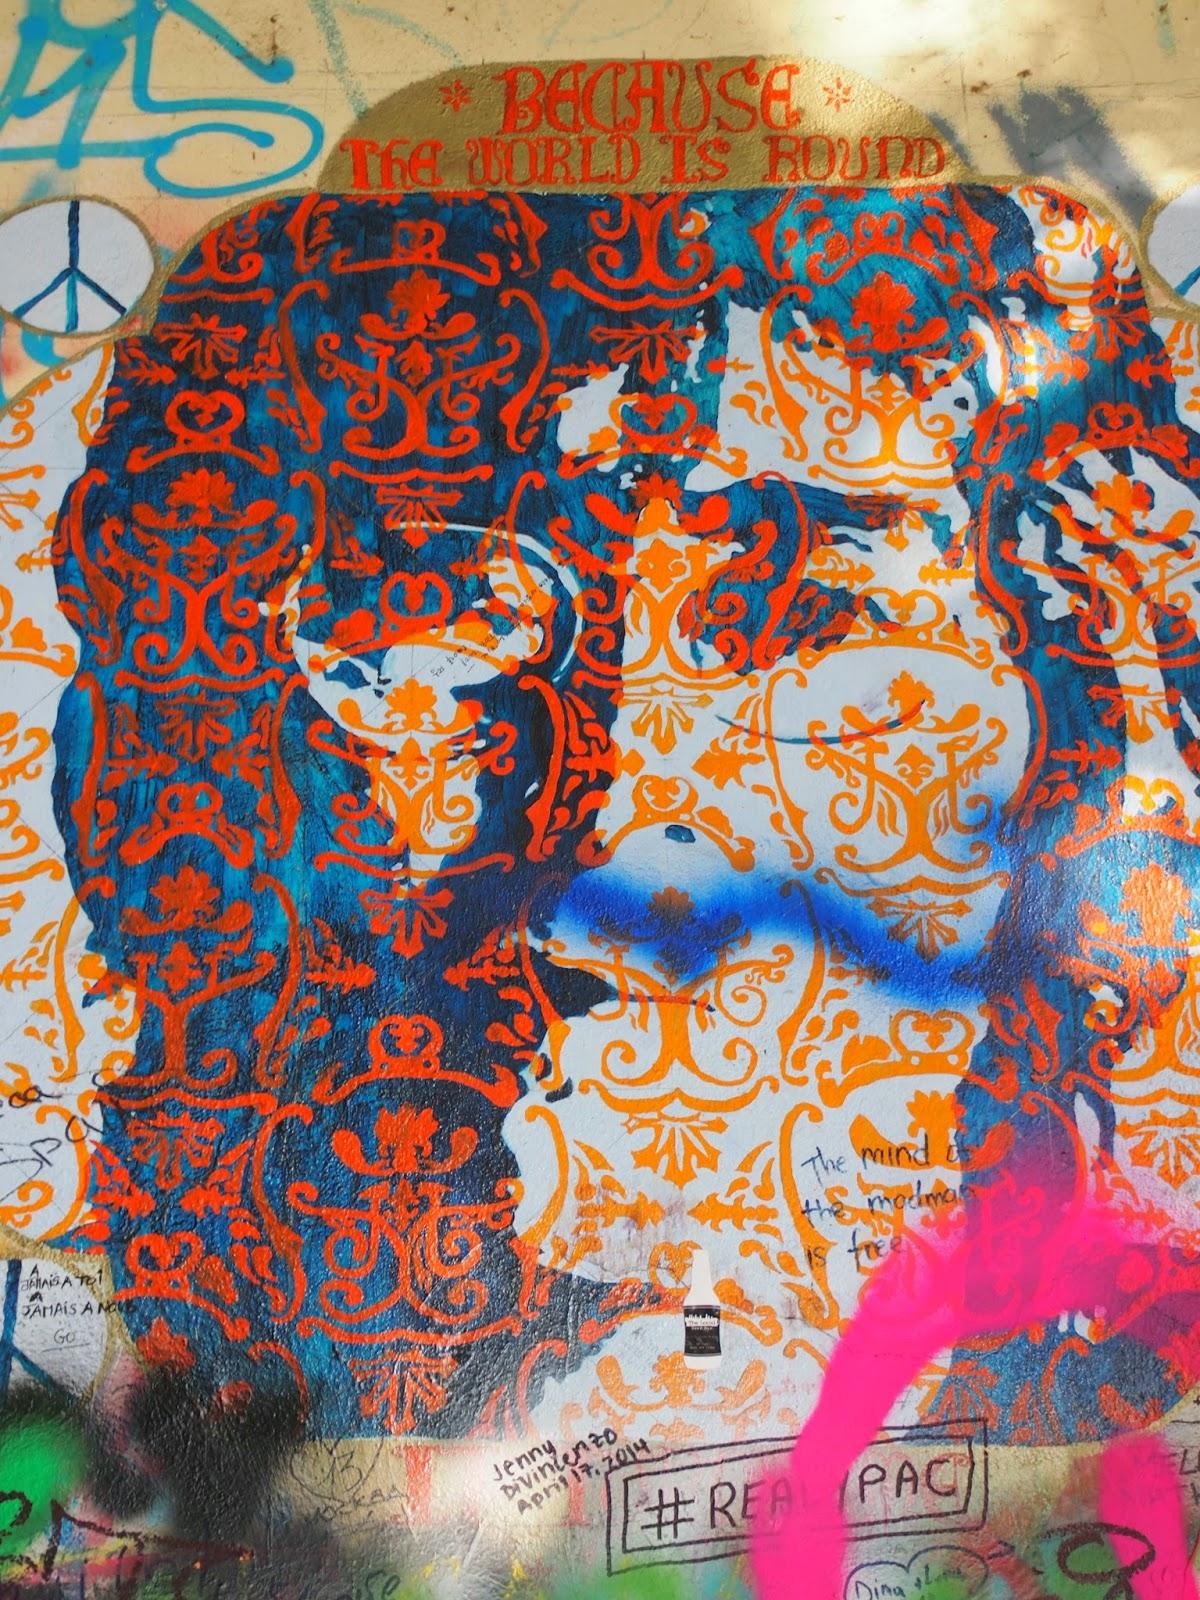 Creative graffiti of John Lennon at the Lennon Wall in Prague